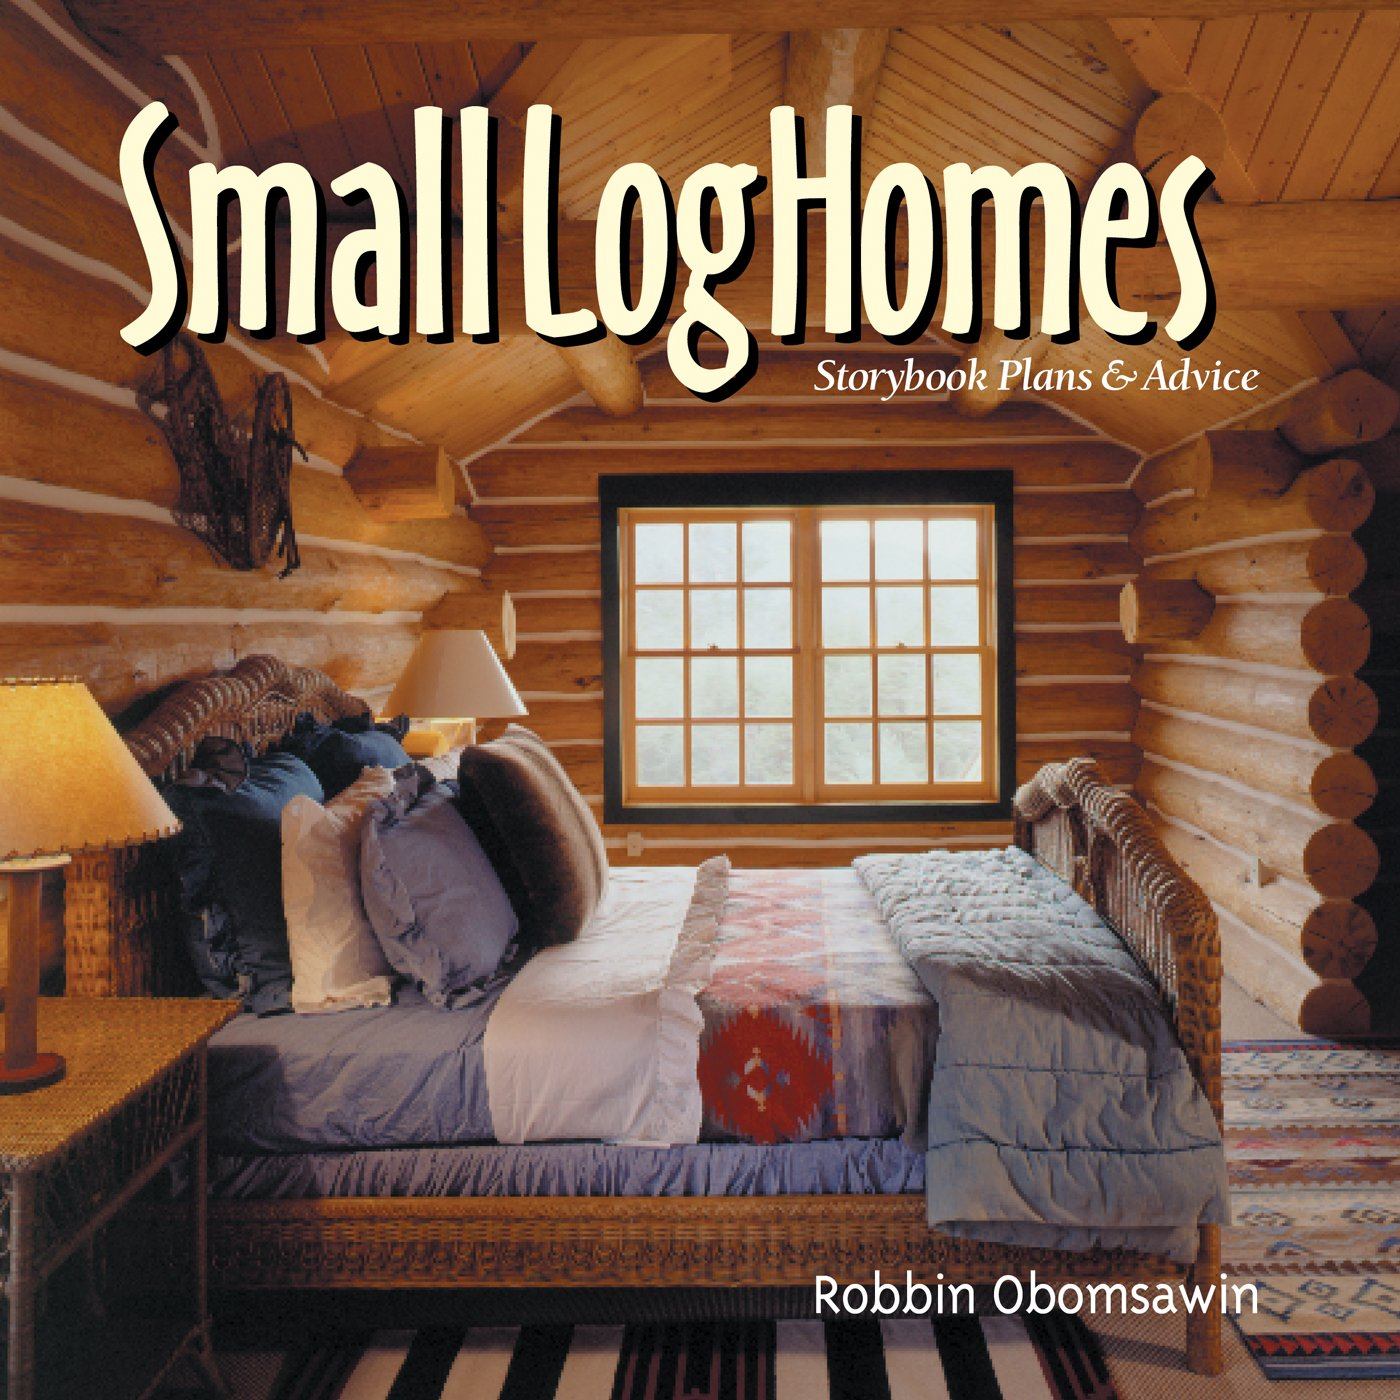 small log homes robbin obomsawin 9781423633334 amazon com books